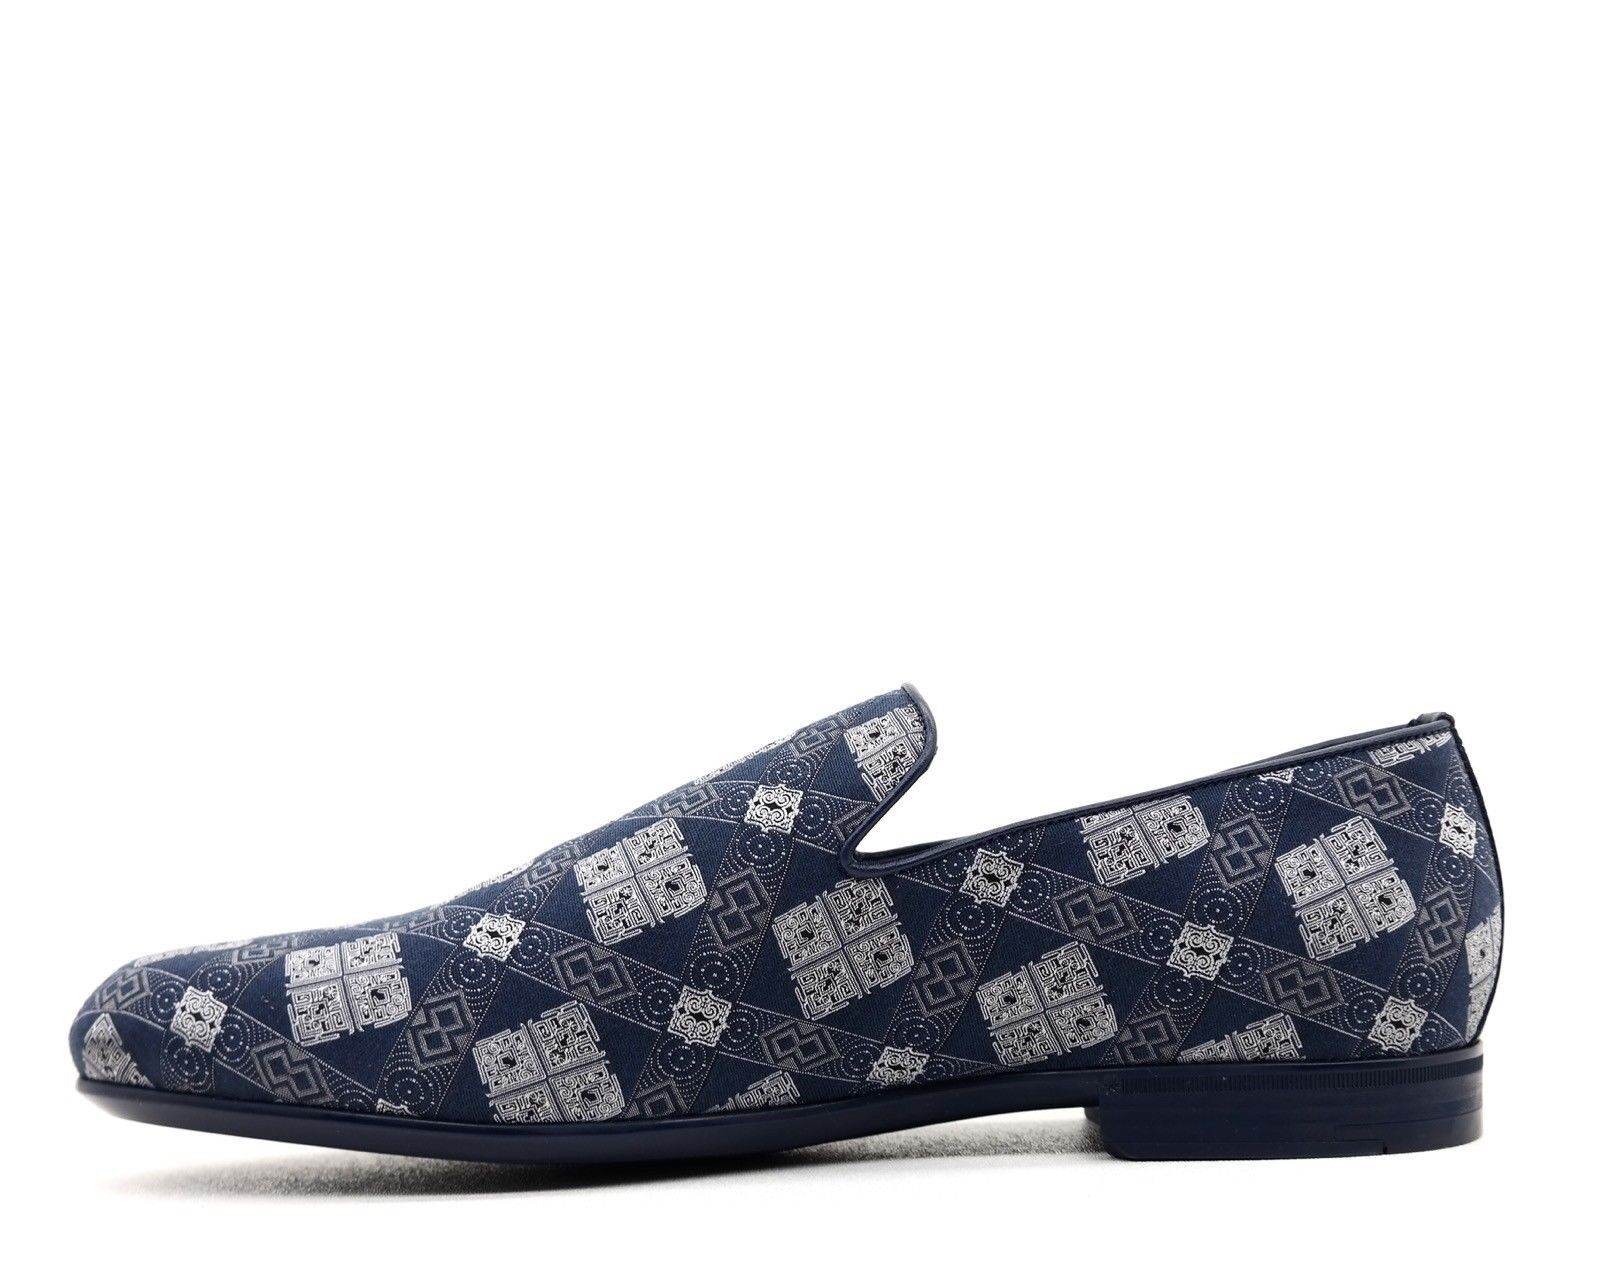 Jimmy Jimmy Jimmy Choo Mocasines Sloane Tela Azul Zapatos sin Cierres Nuevo en Caja 97b145